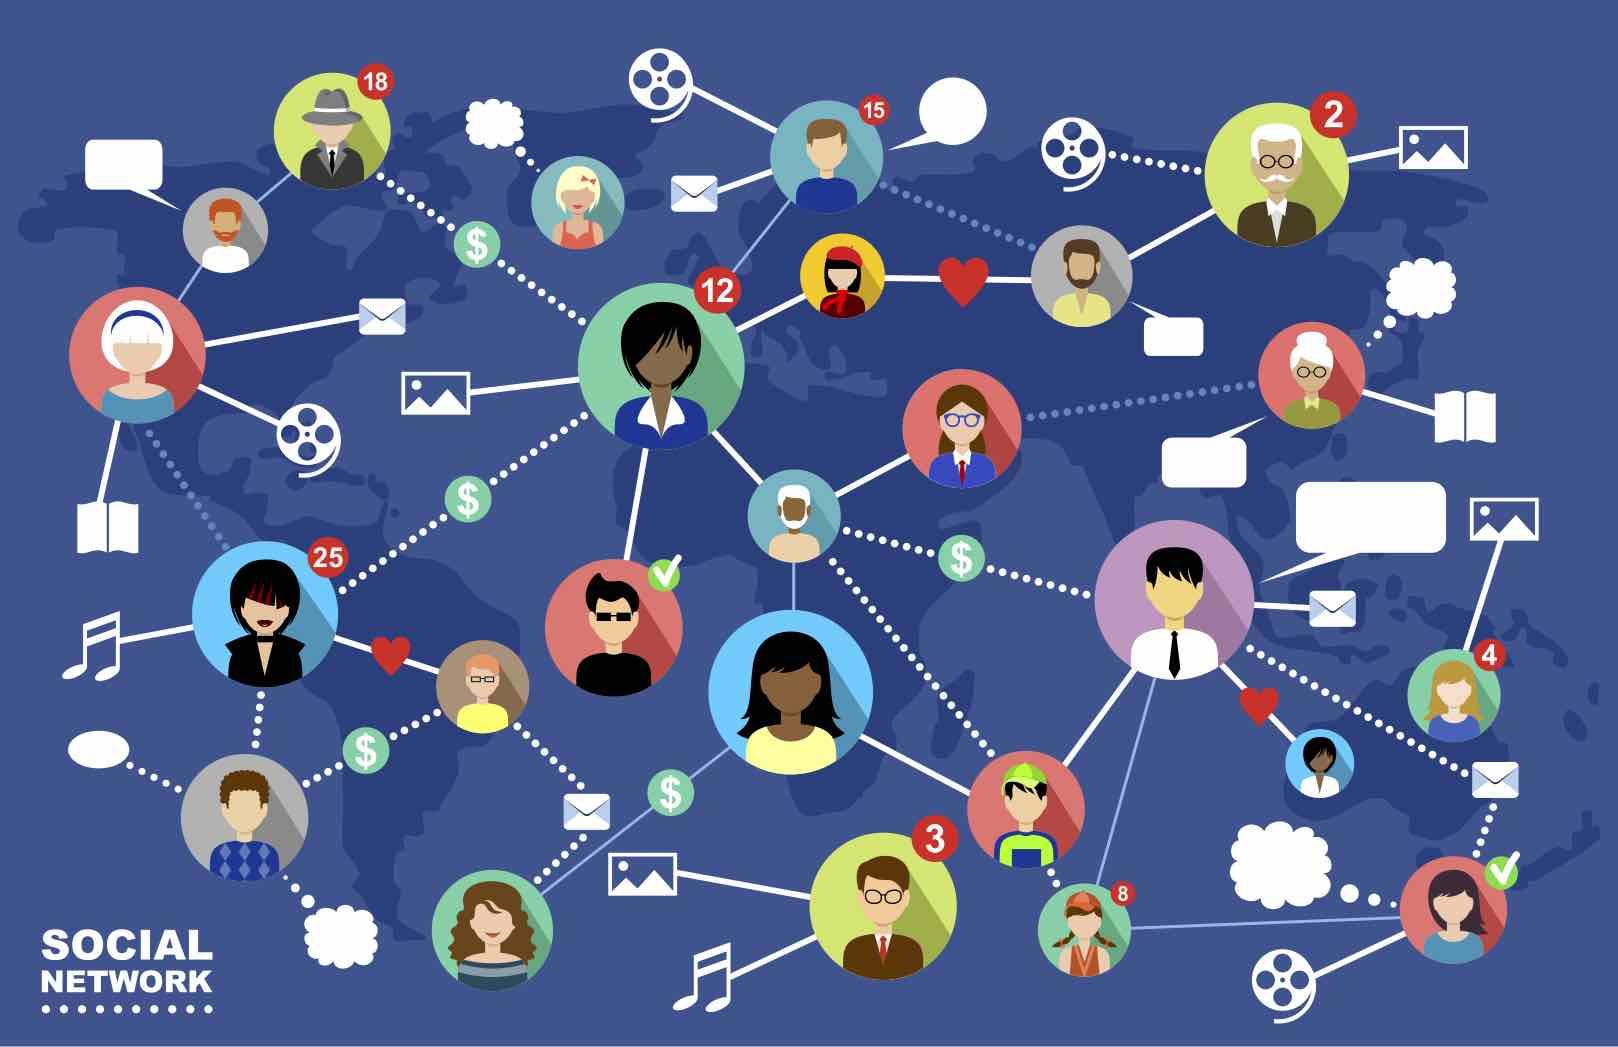 xconsultorio-em-redes-sociais-jpg-pagespeed-ic-vw-fp0dgqg